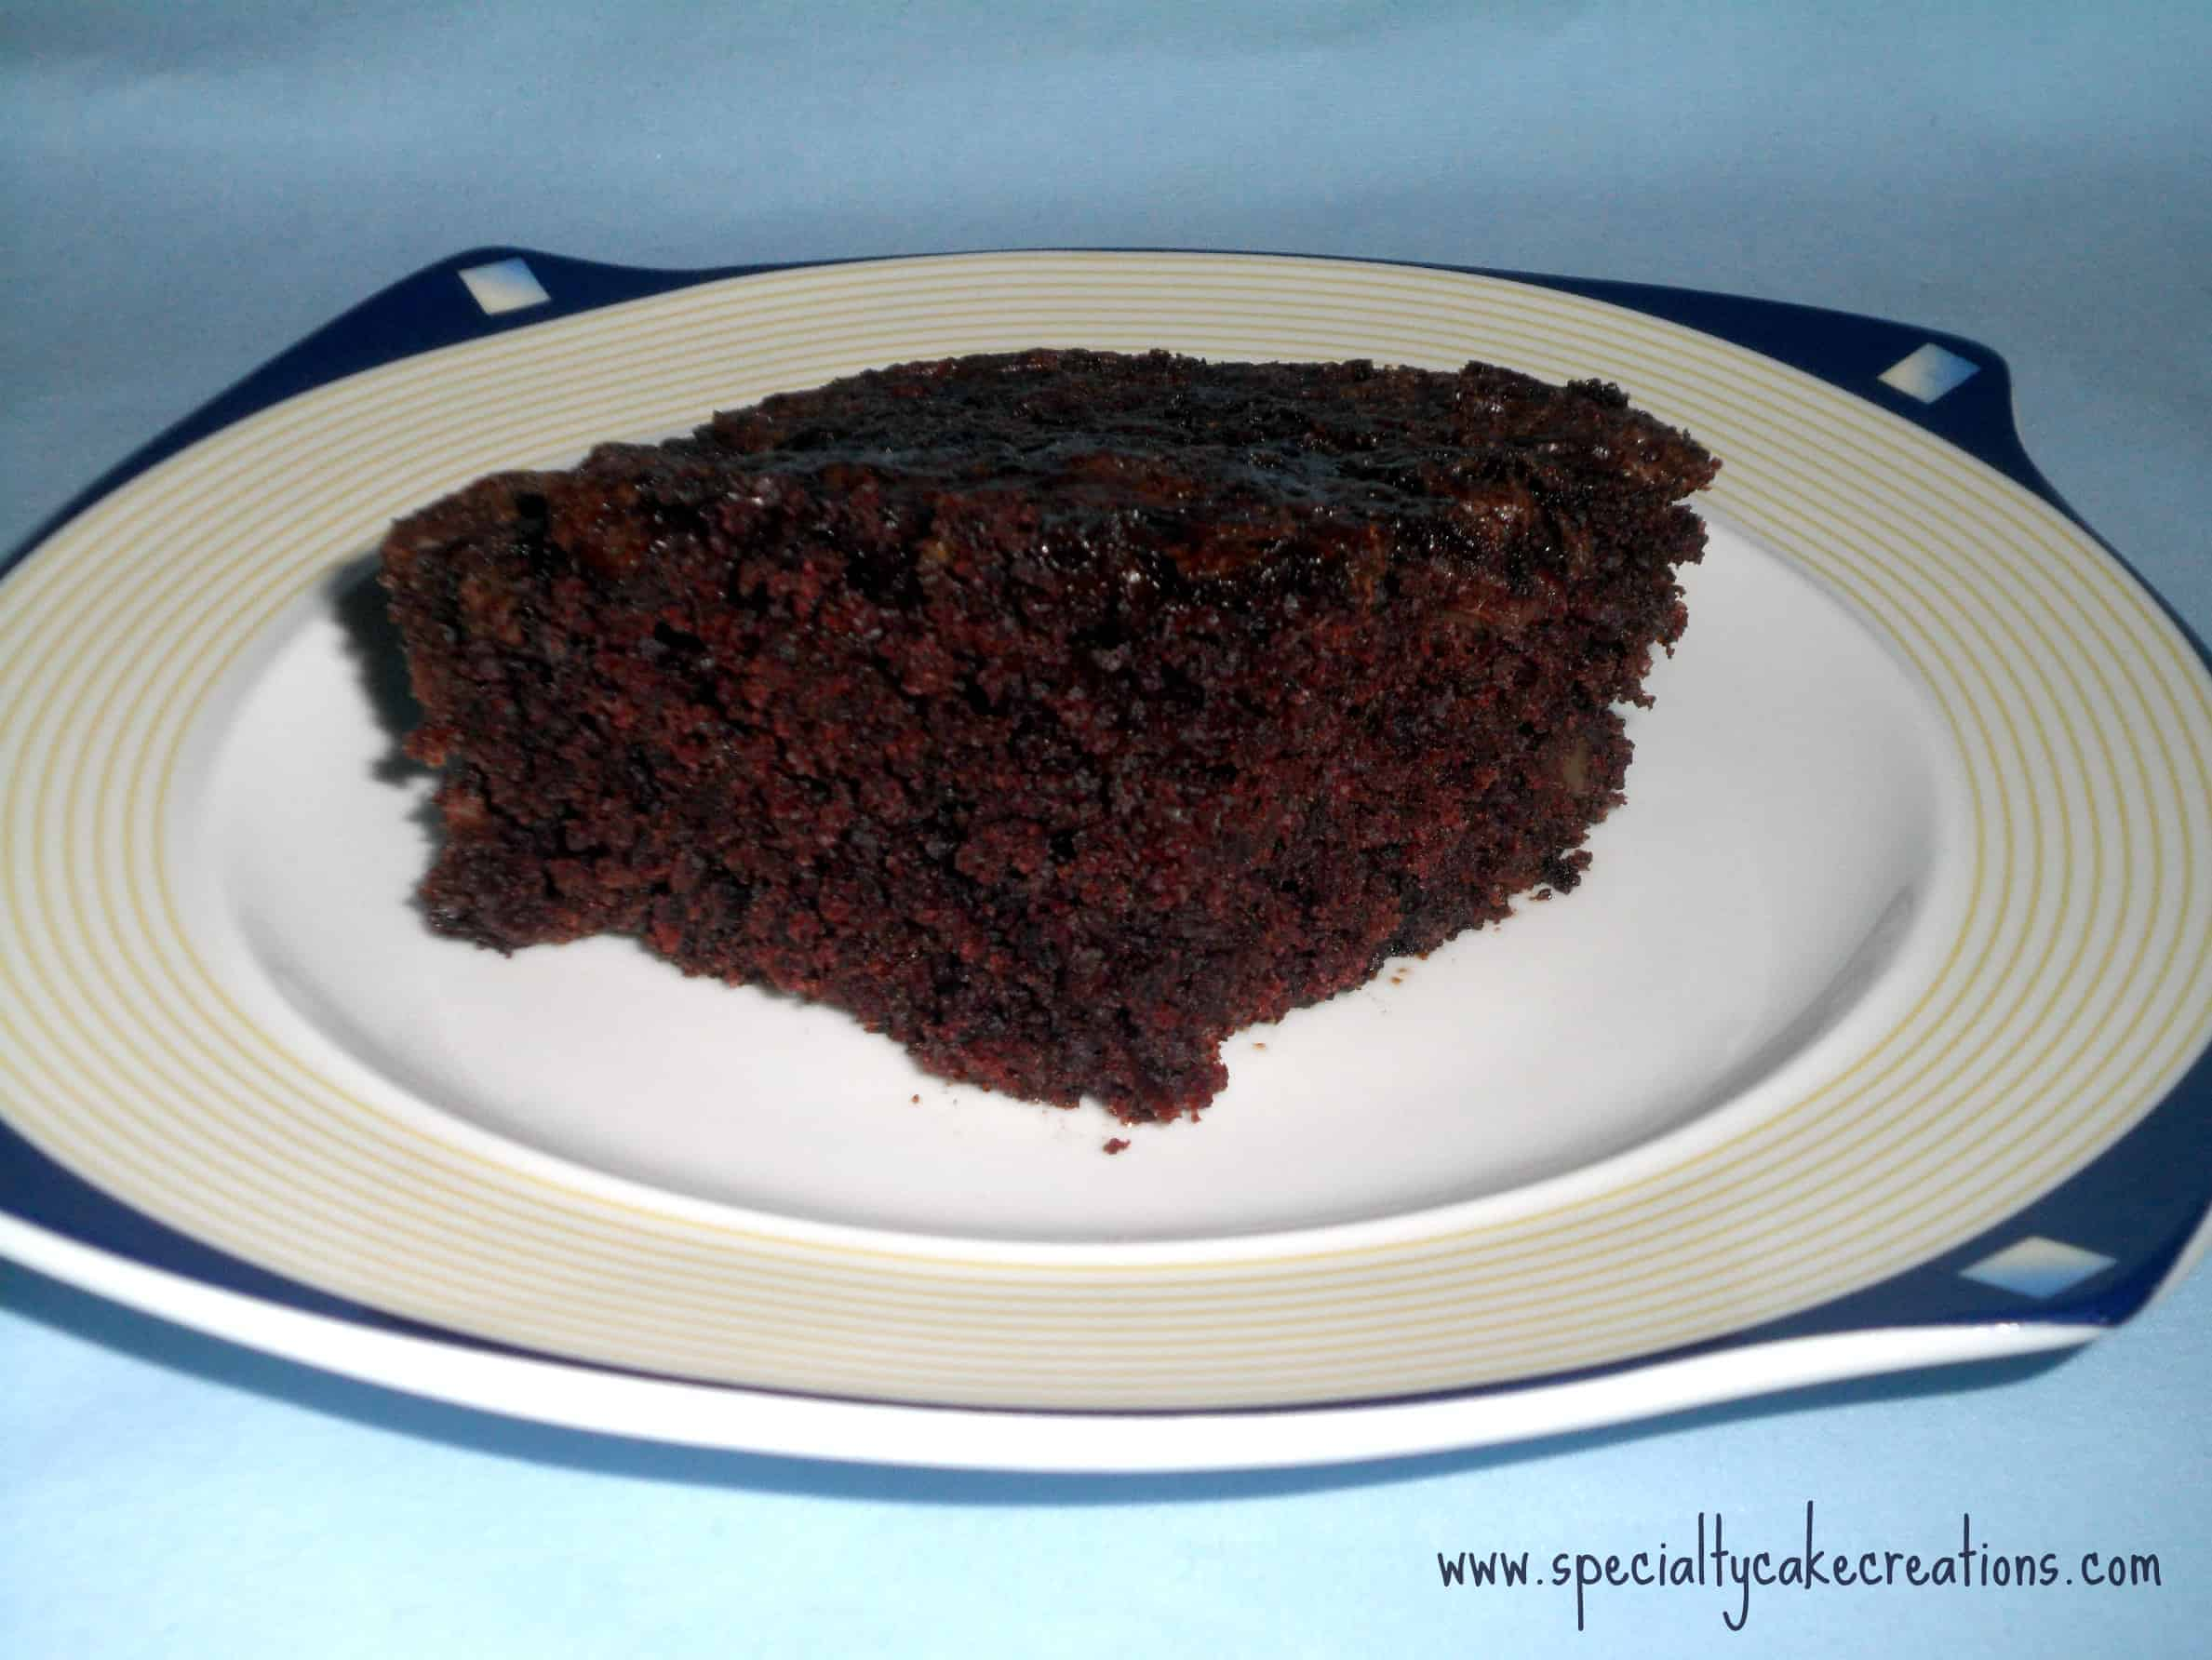 Chocolate Brownie Slice on Plate